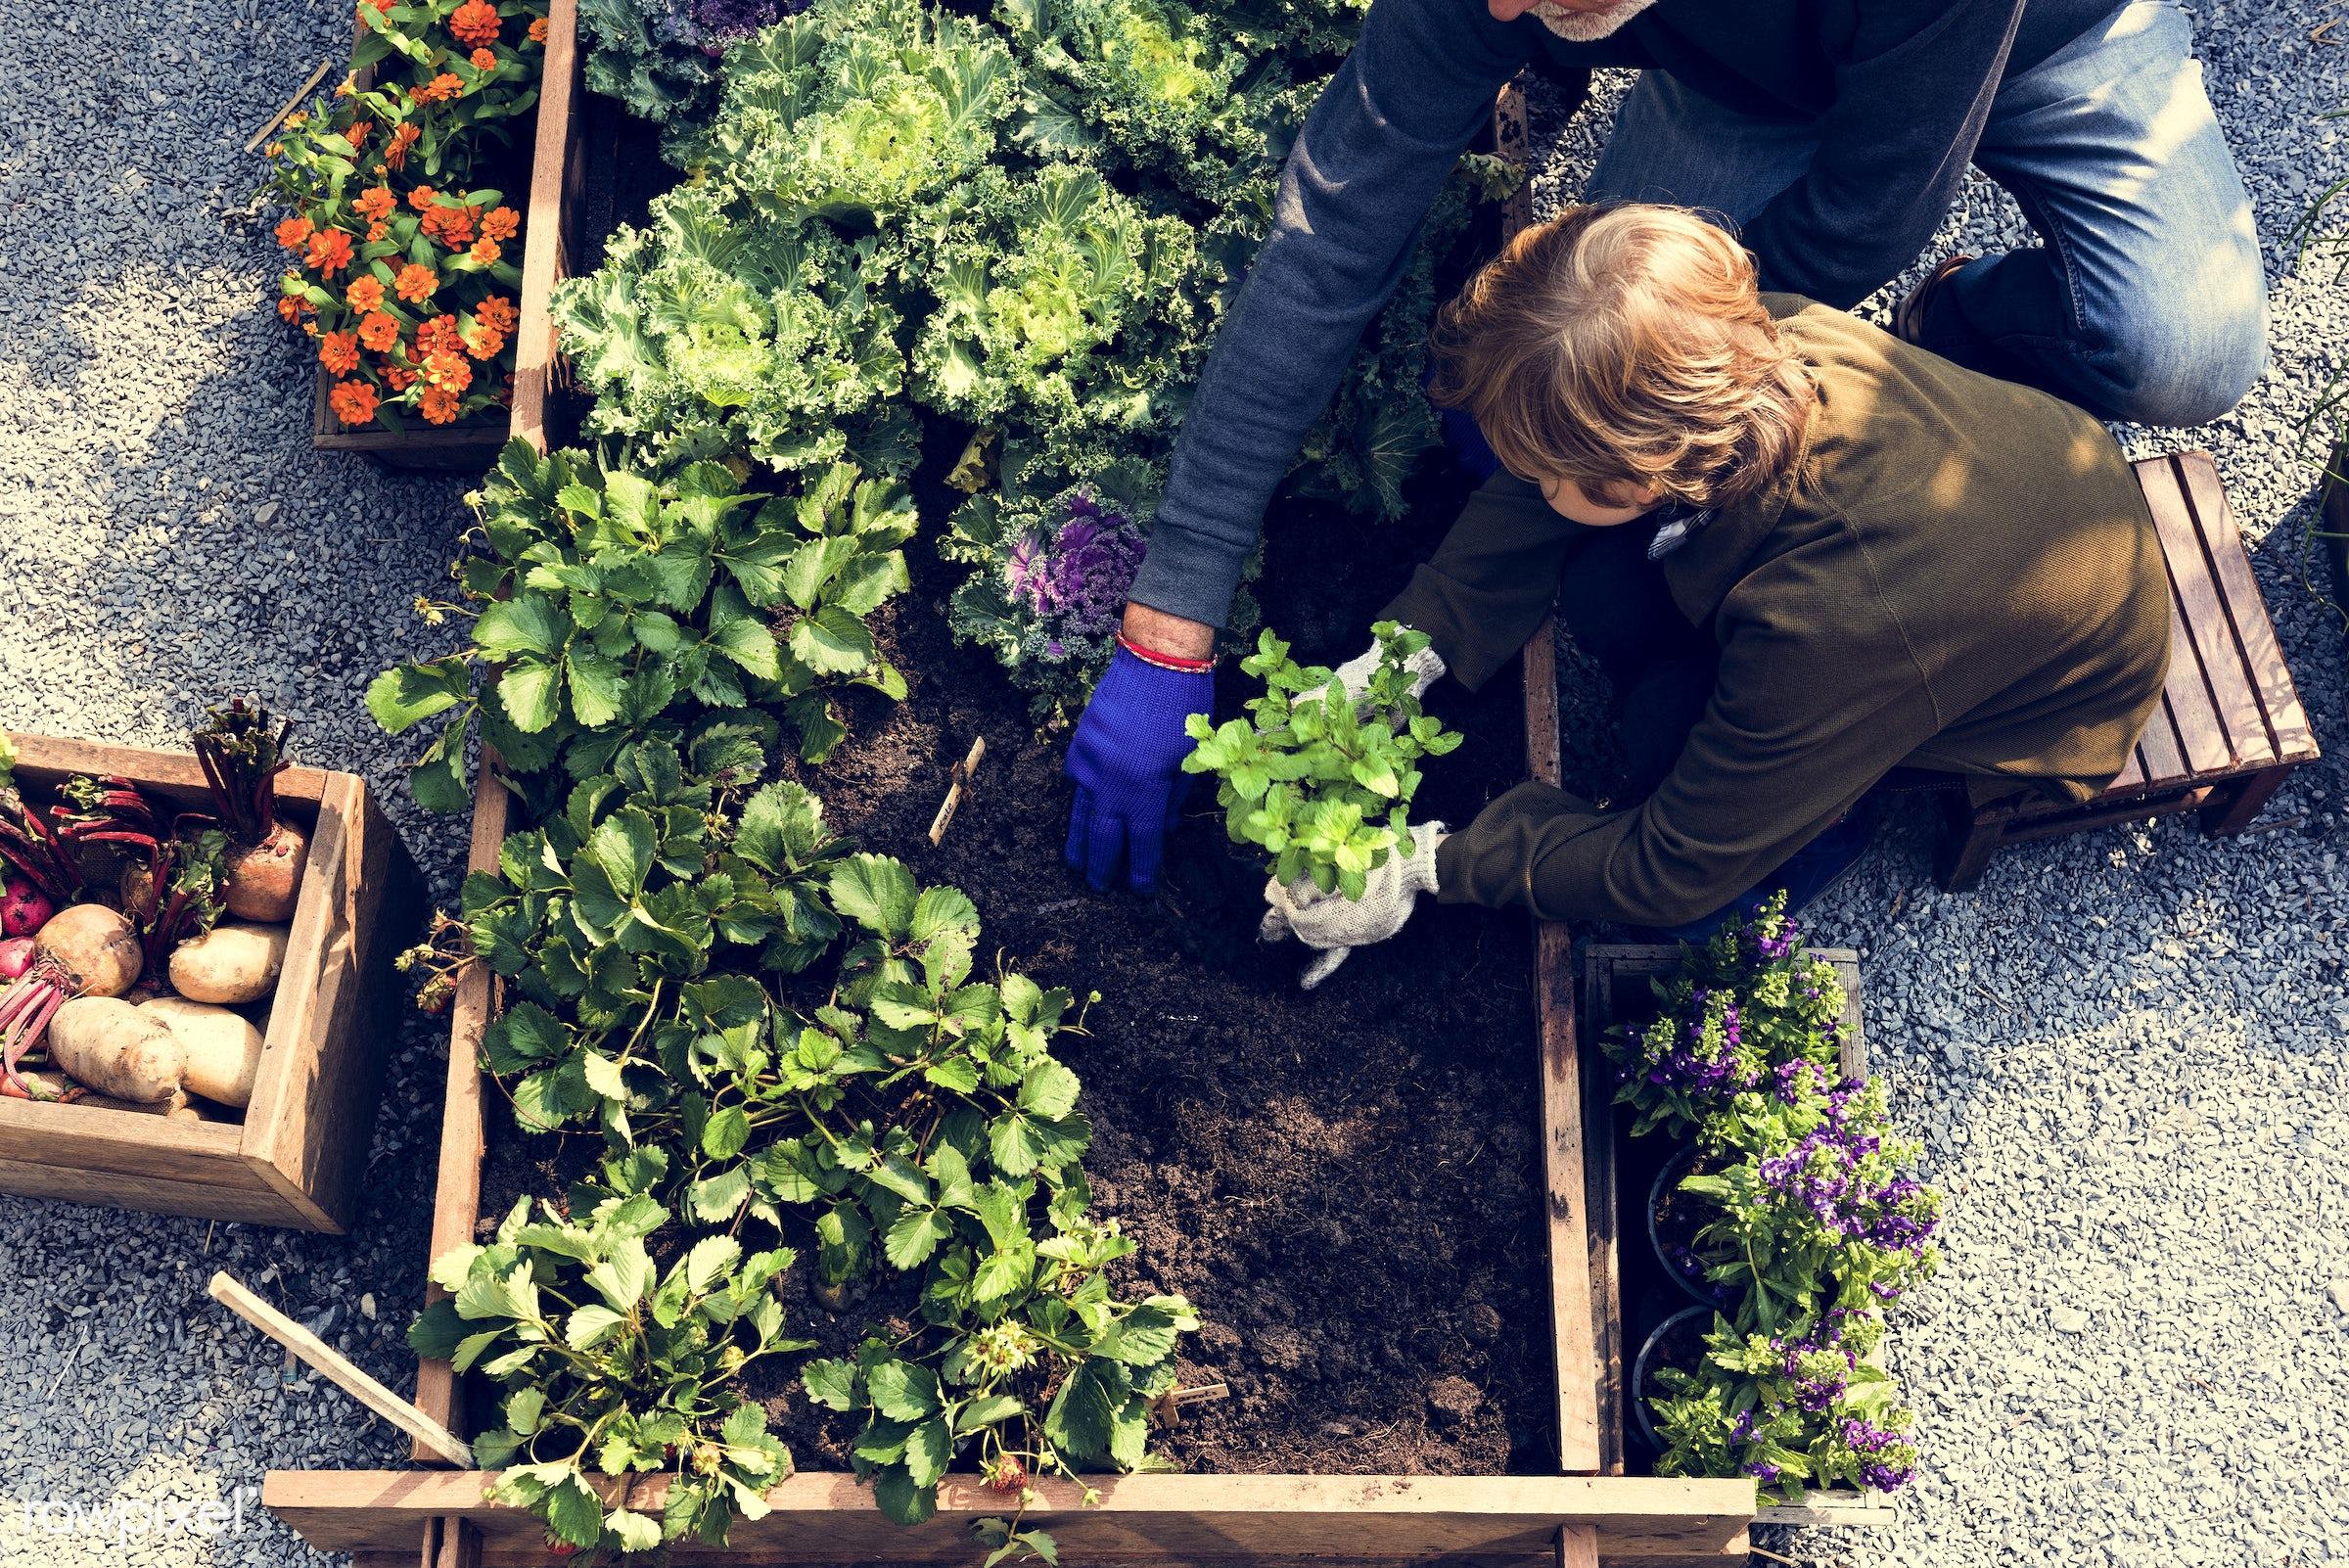 plant, carrot, nutritious, grandfather, basil, farmer, fresh, lettuce, family, healthy eating, grandson, man, flower, green...